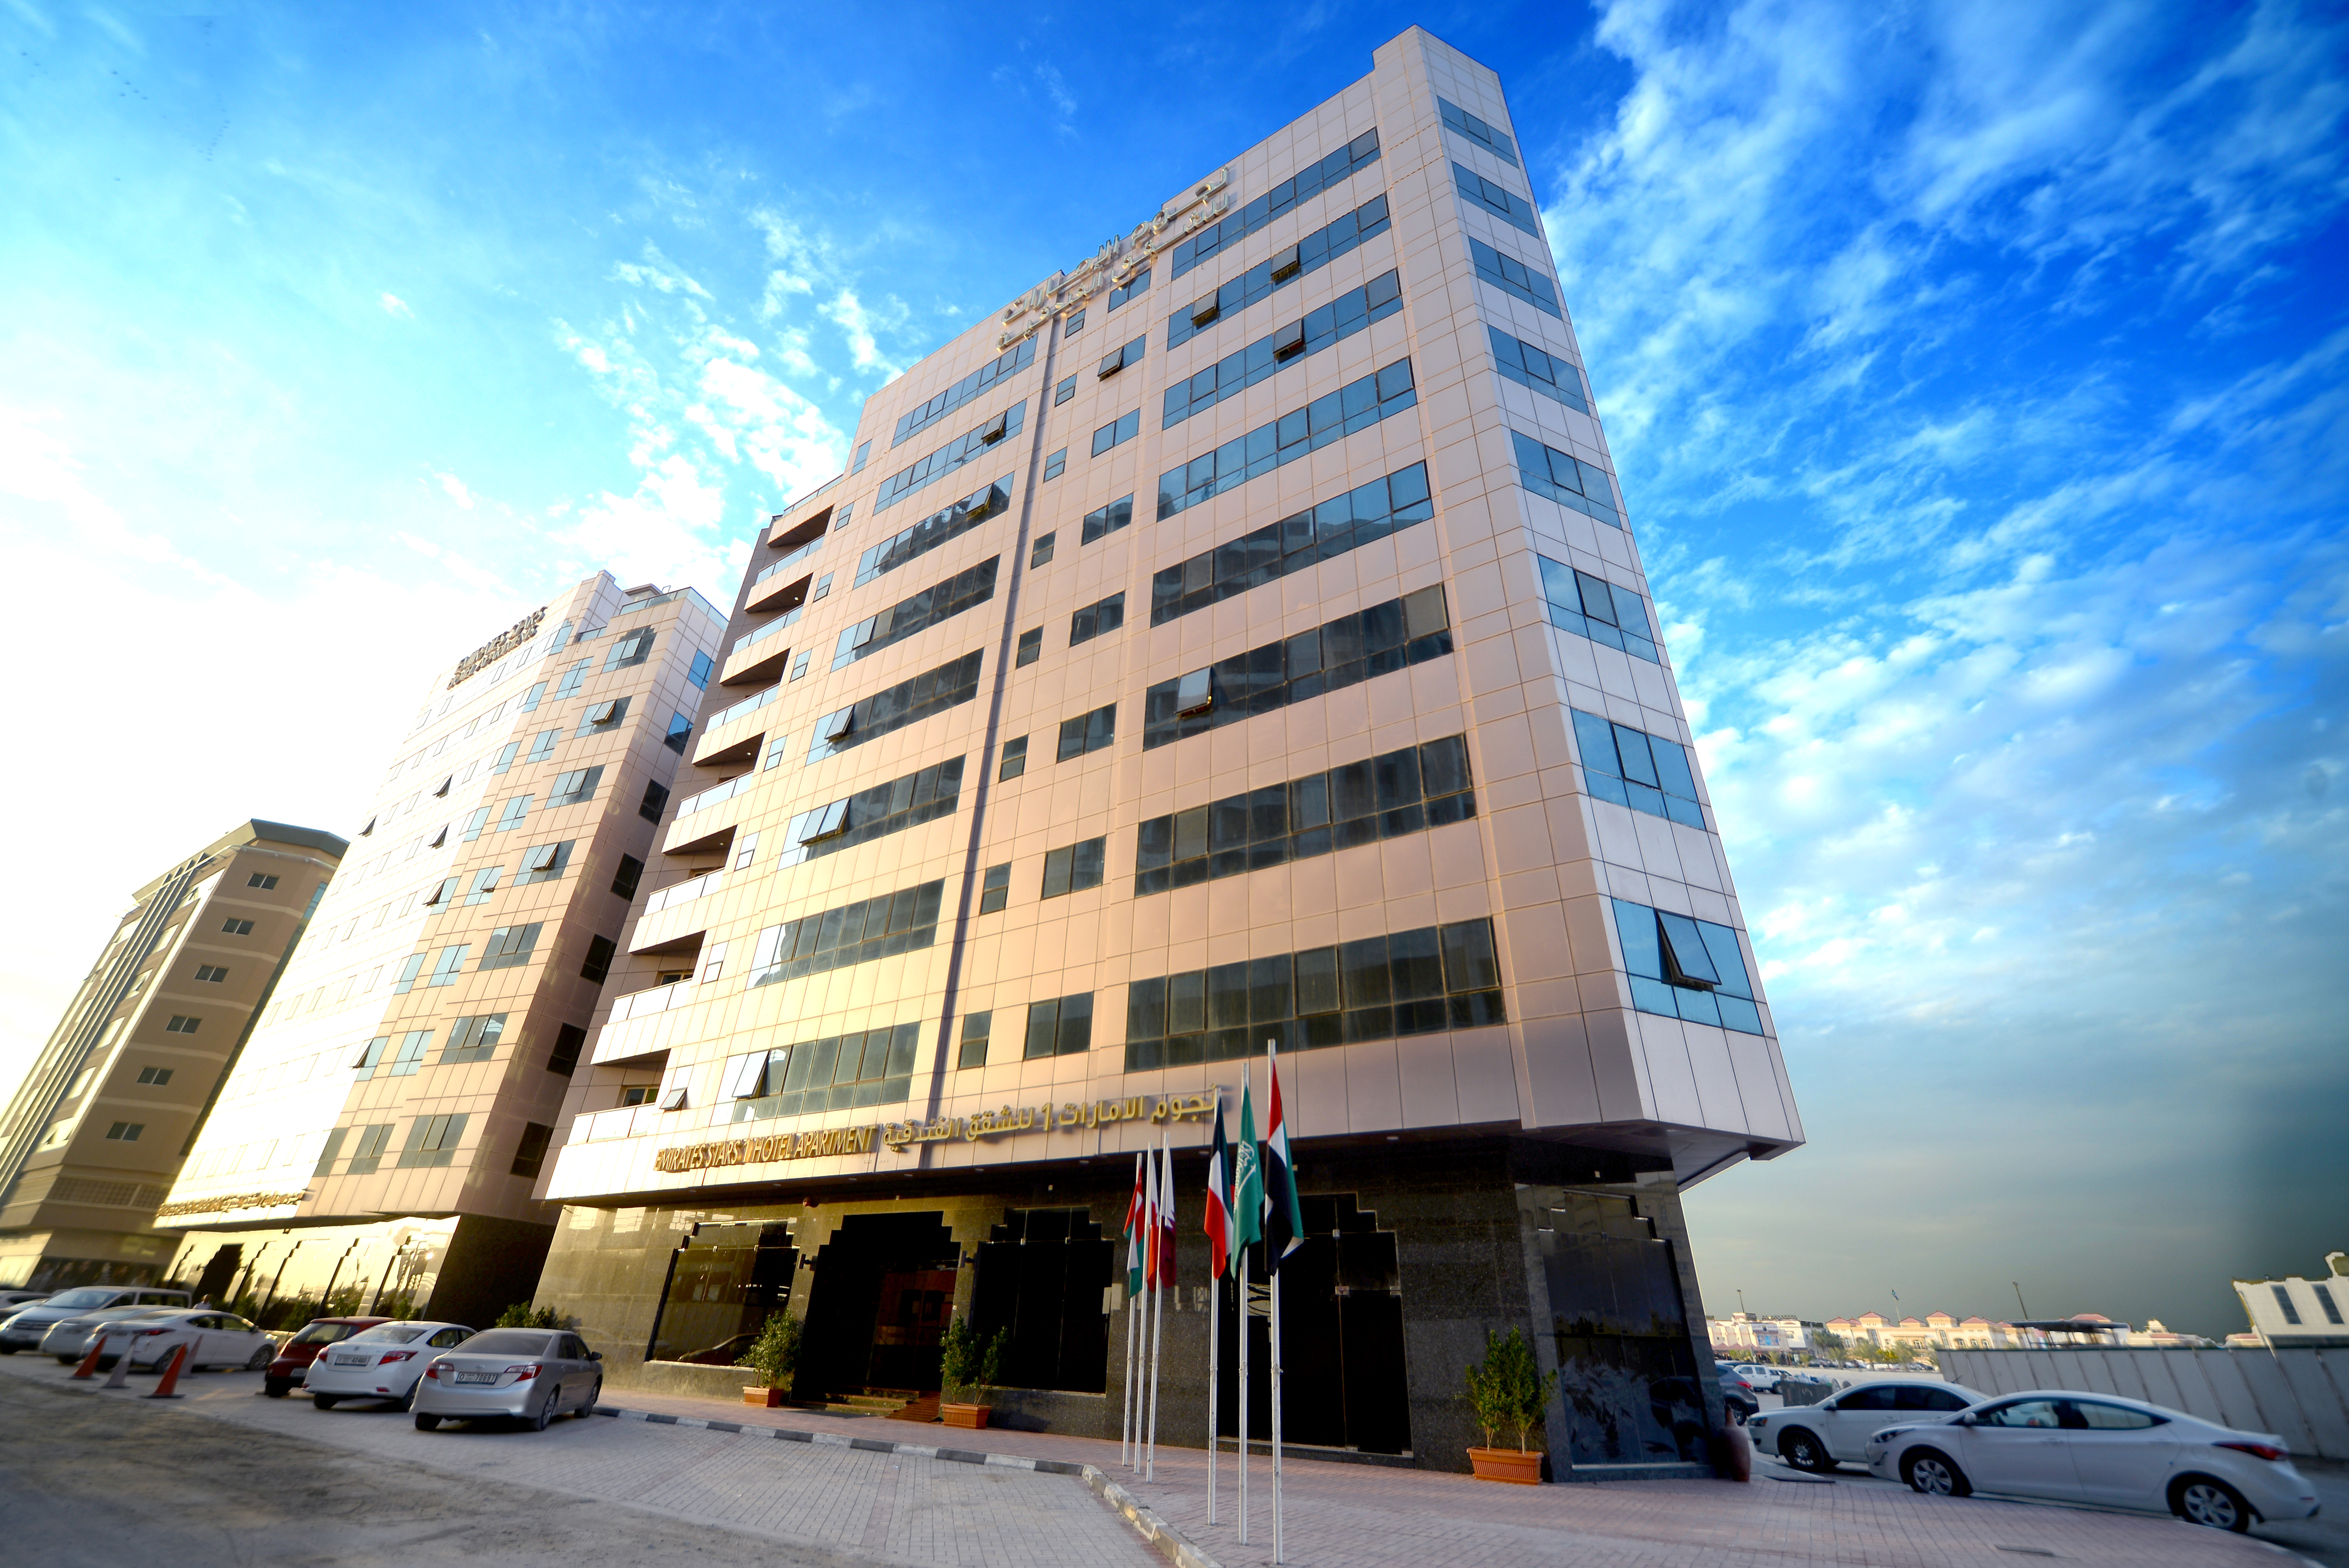 Emirates Stars Hotel Apartment Sharjah